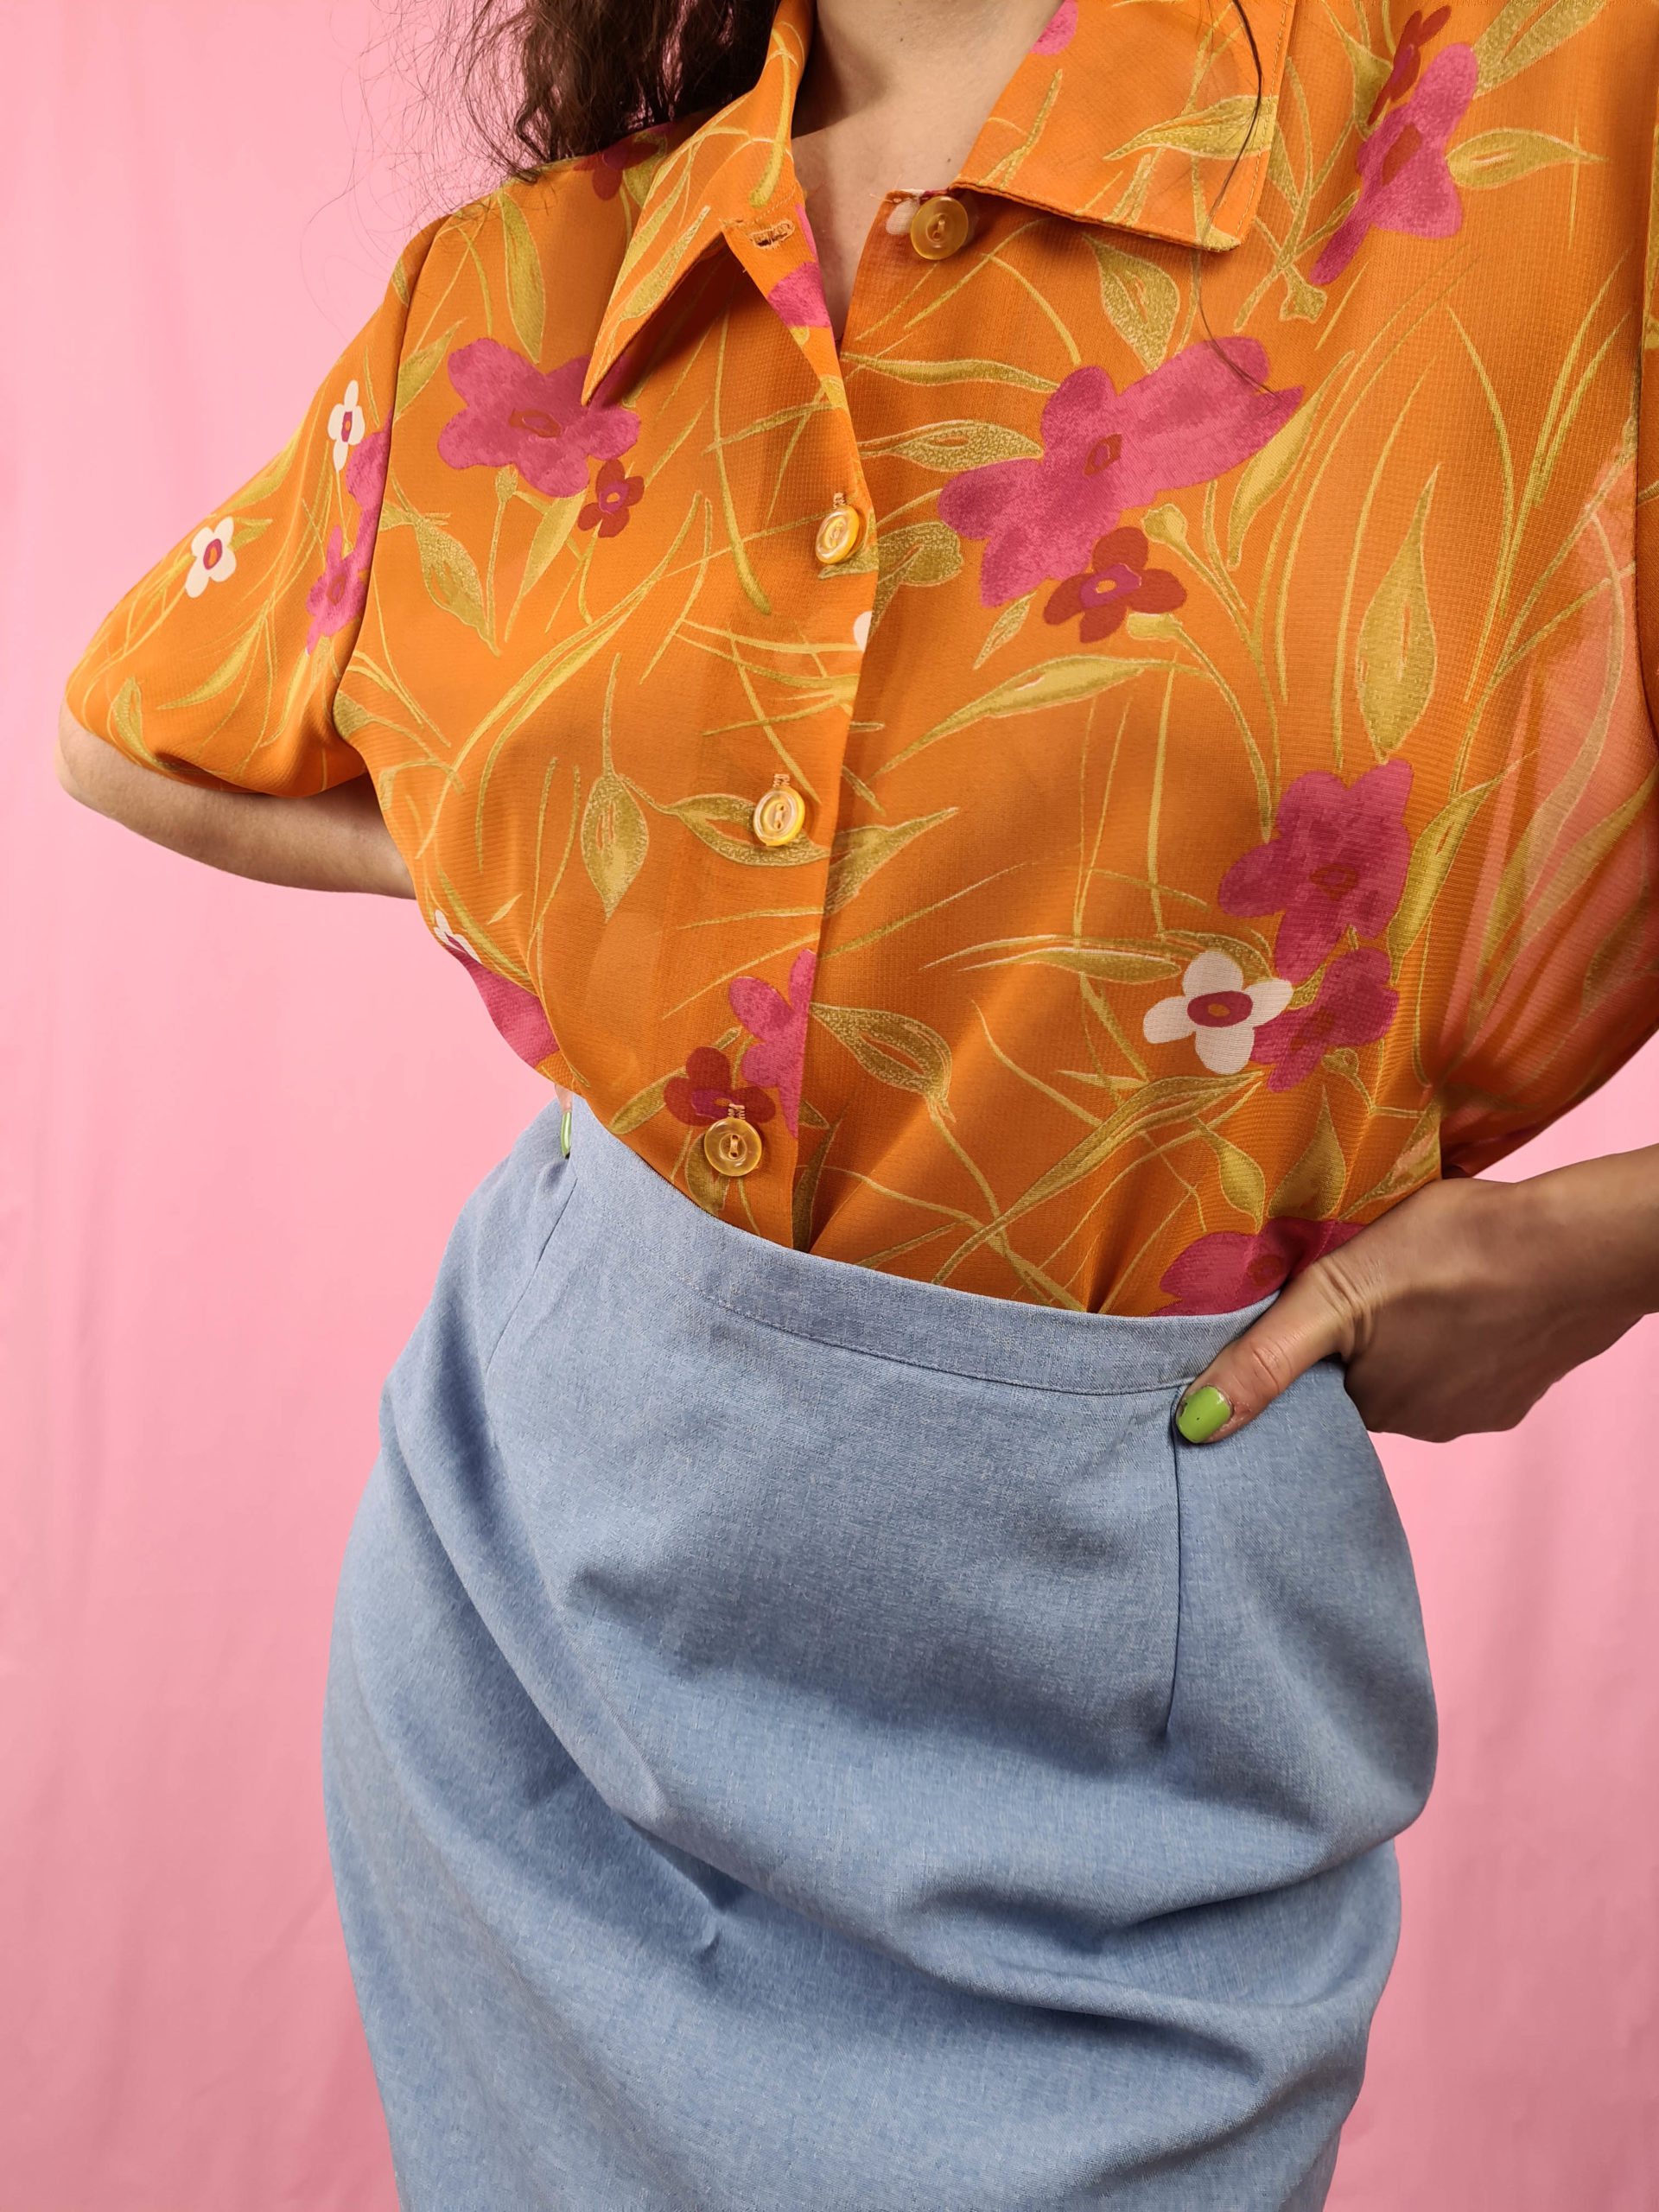 chemise orange fleurie manches courtes (3)